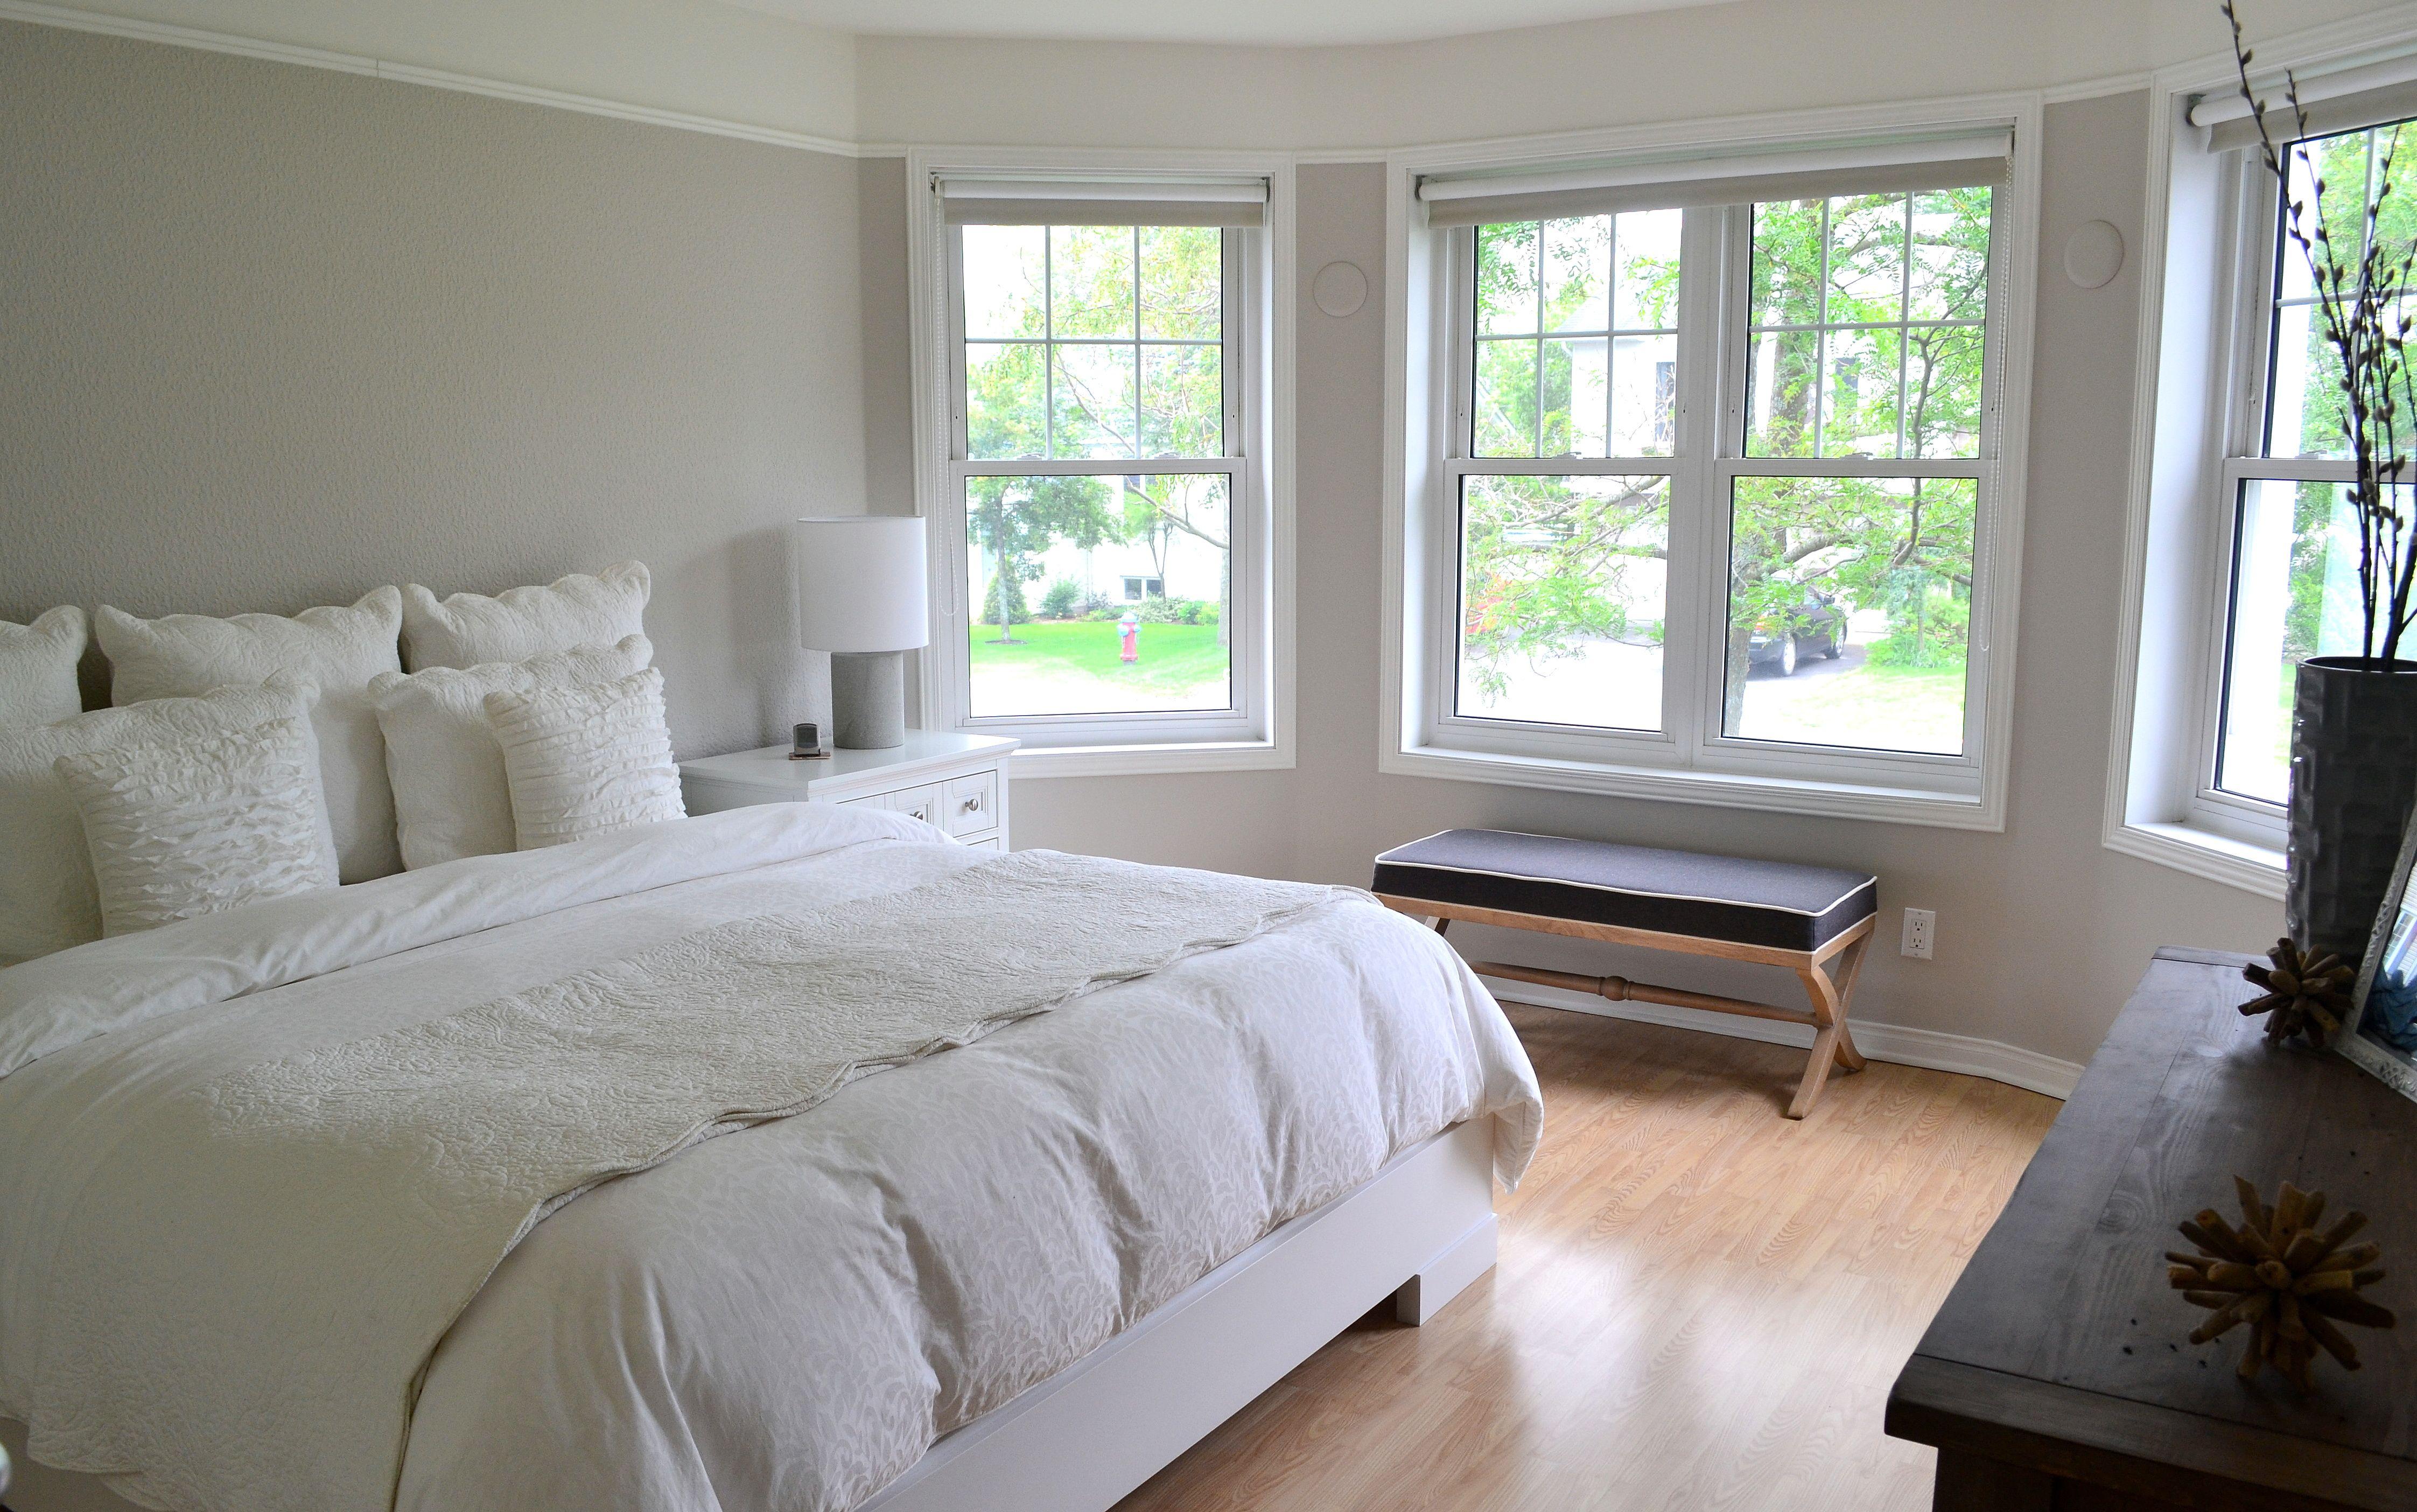 Chambre A Coucher Classique Blanc Grande Fenetres Home Decor Home Furniture